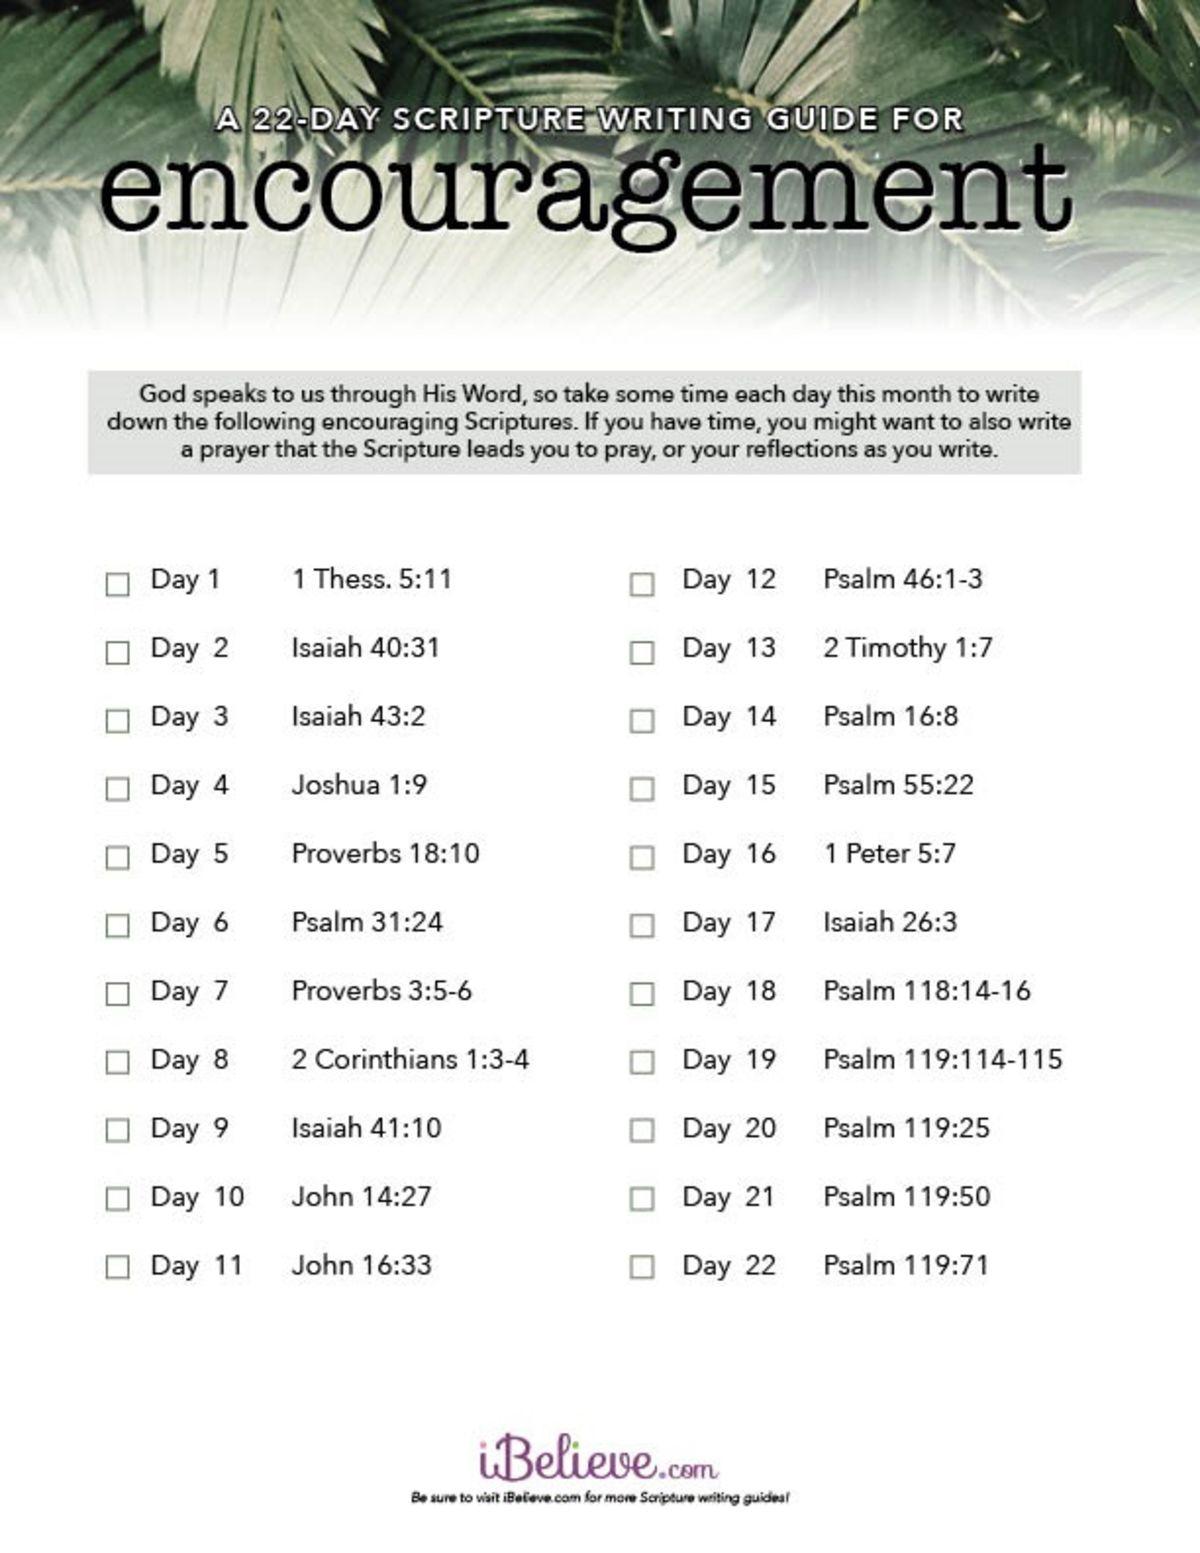 Encouragement Scripture Writing Guide